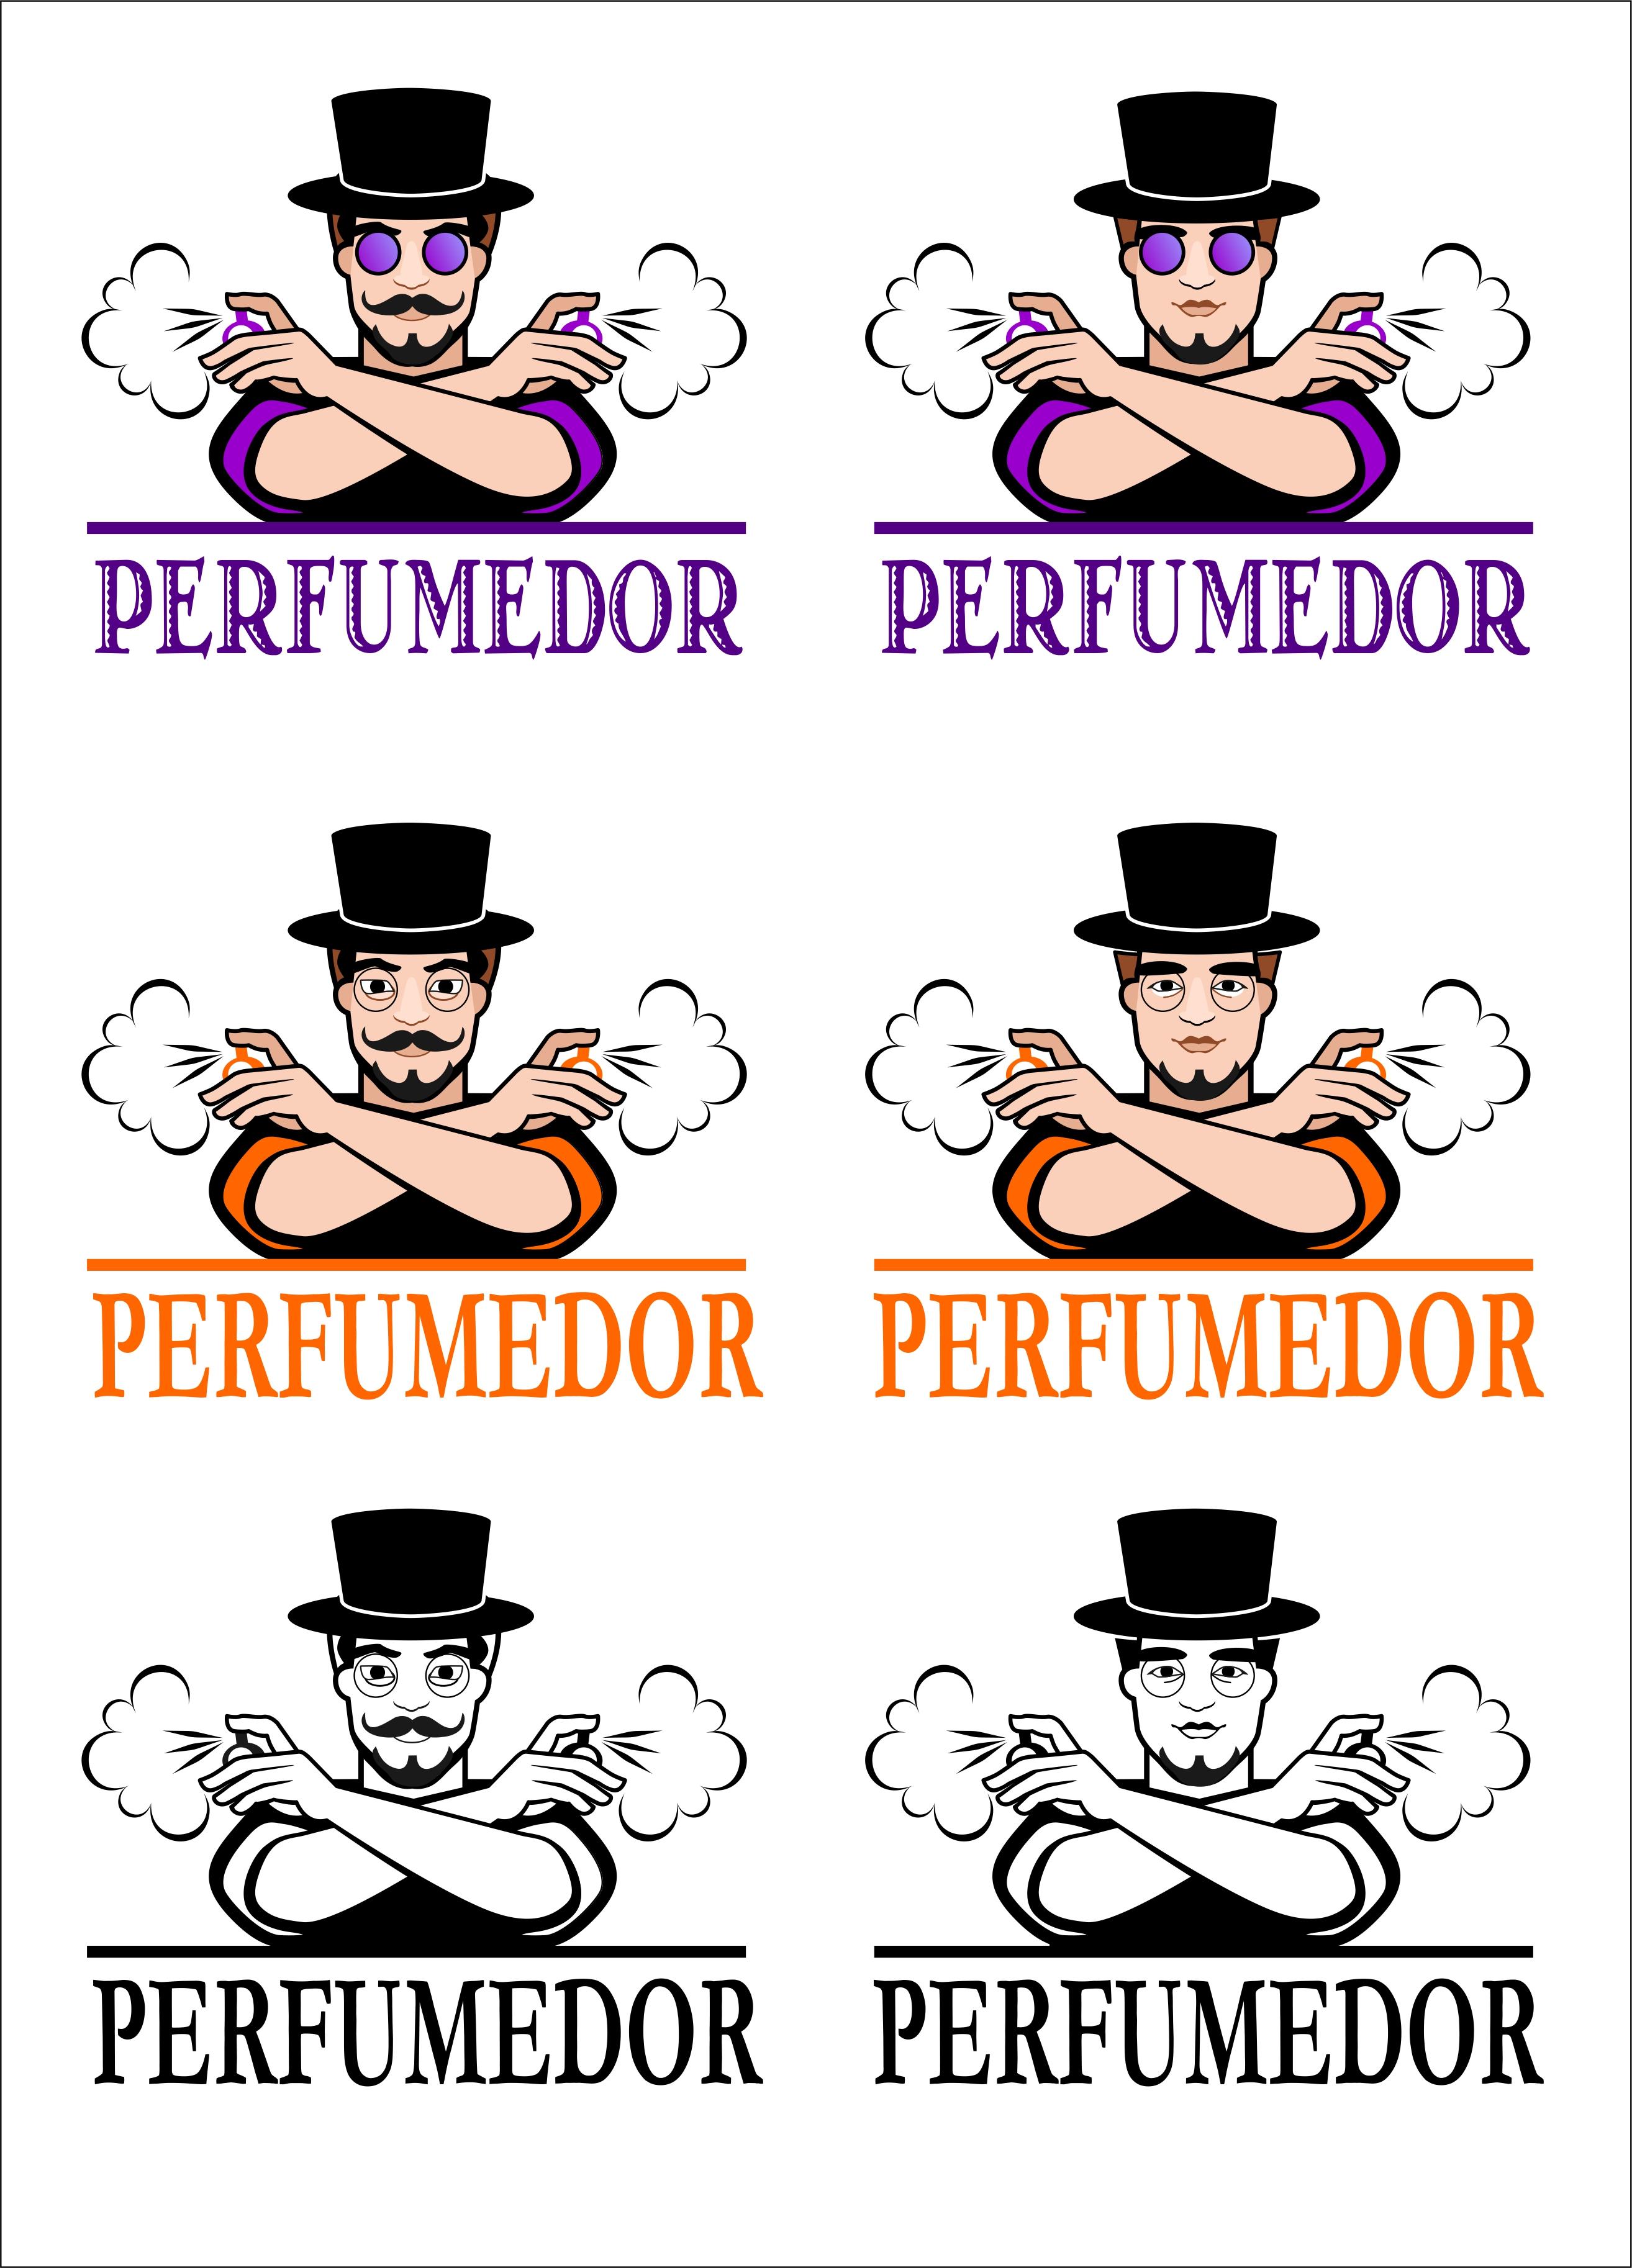 Логотип для интернет-магазина парфюмерии фото f_0215b472891ddc49.jpg